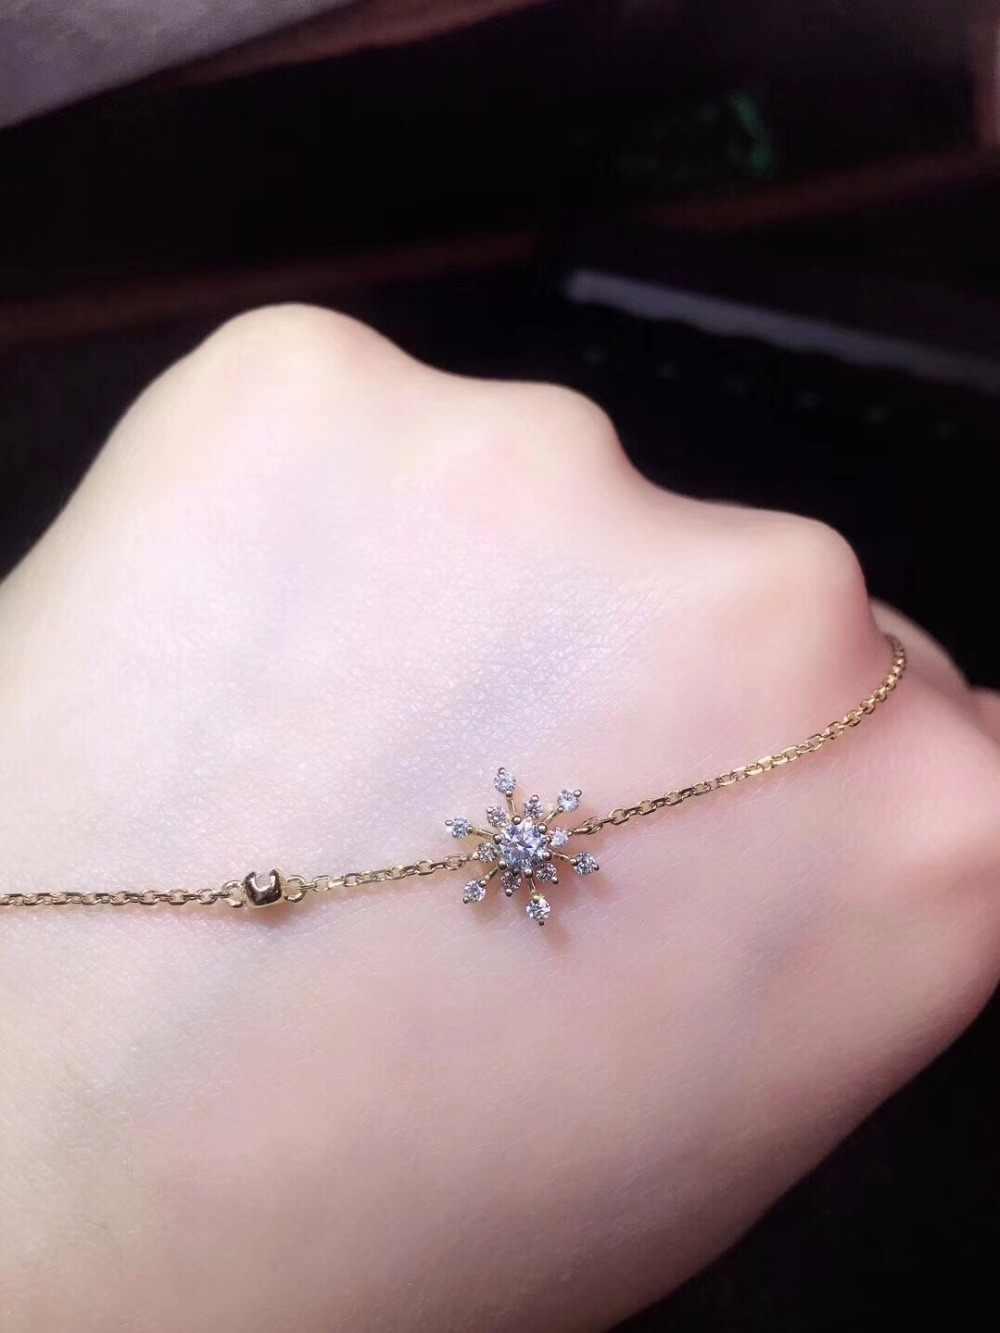 Fine Jewelry Real K Ouro Branco AU750 18 G18K 100% Natural Diamond Star Jóias Amor Pulseiras para as mulheres Pulseira Fina